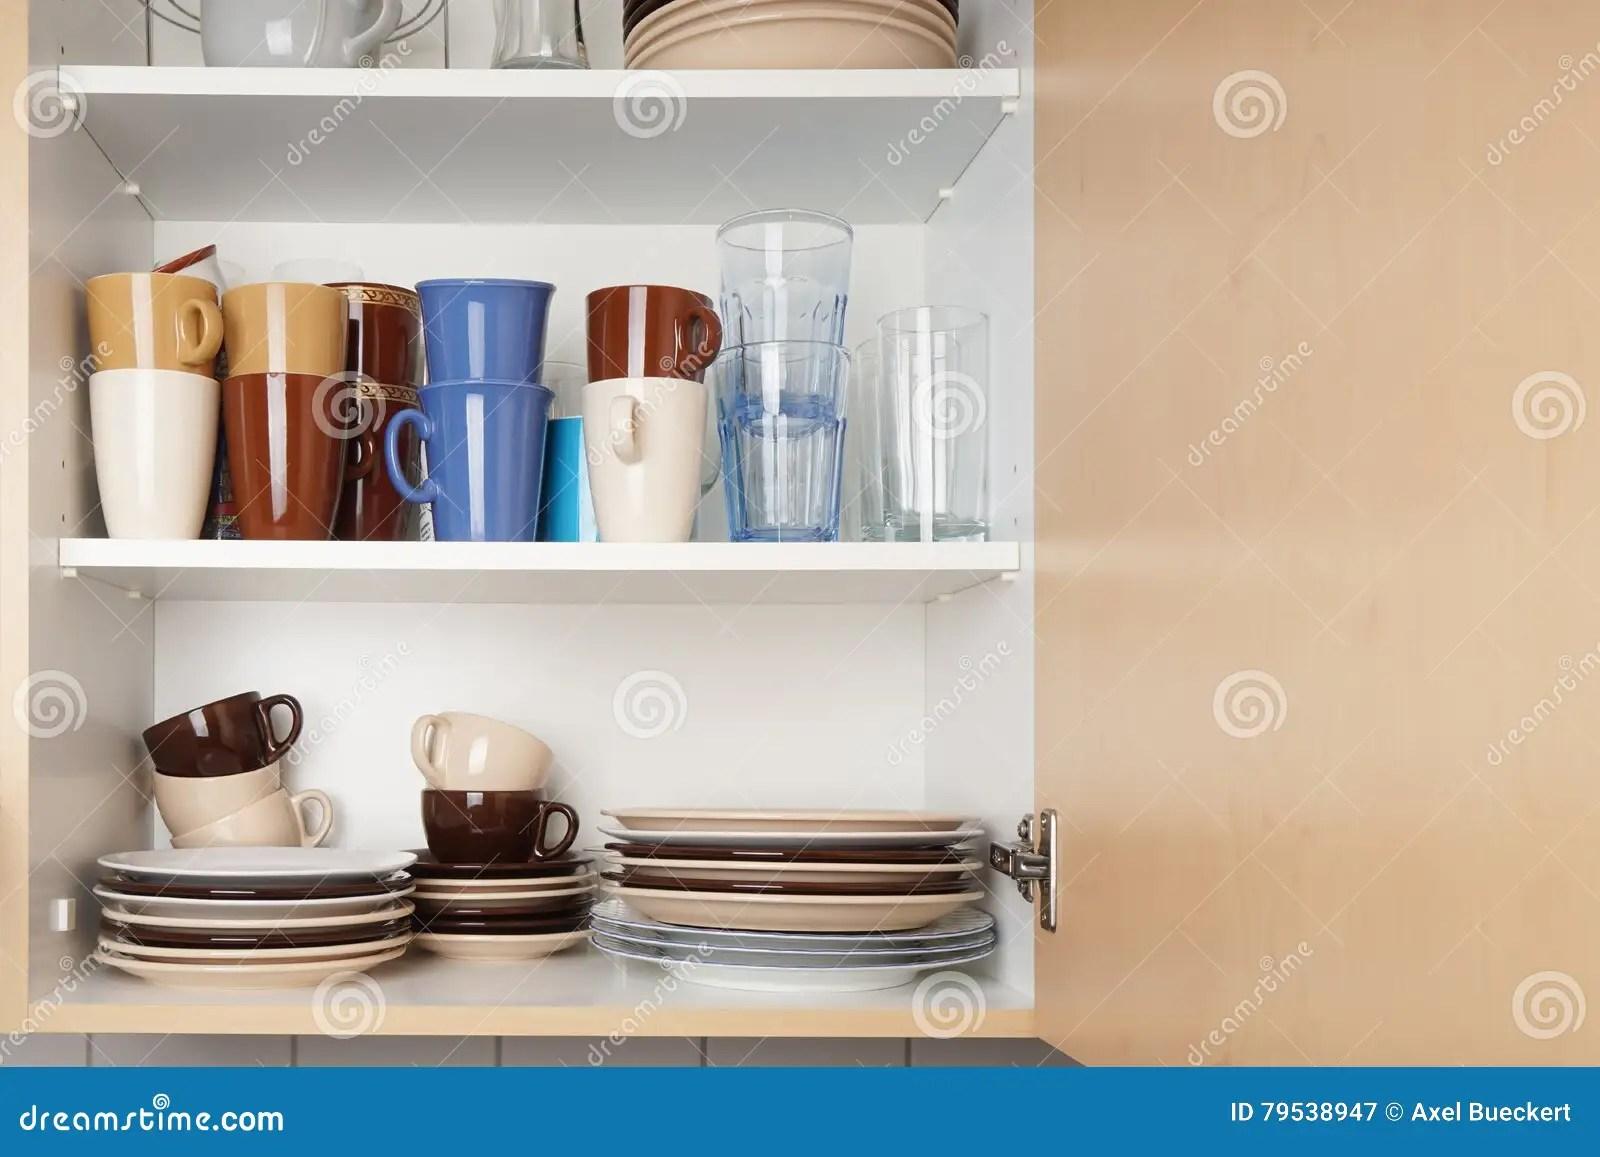 colorful kitchen cabinets rug ideas 厨柜或碗柜盘的库存图片 图片包括有多彩多姿 粗陶器 混合 碗柜 牌照 厨柜或碗柜盘的